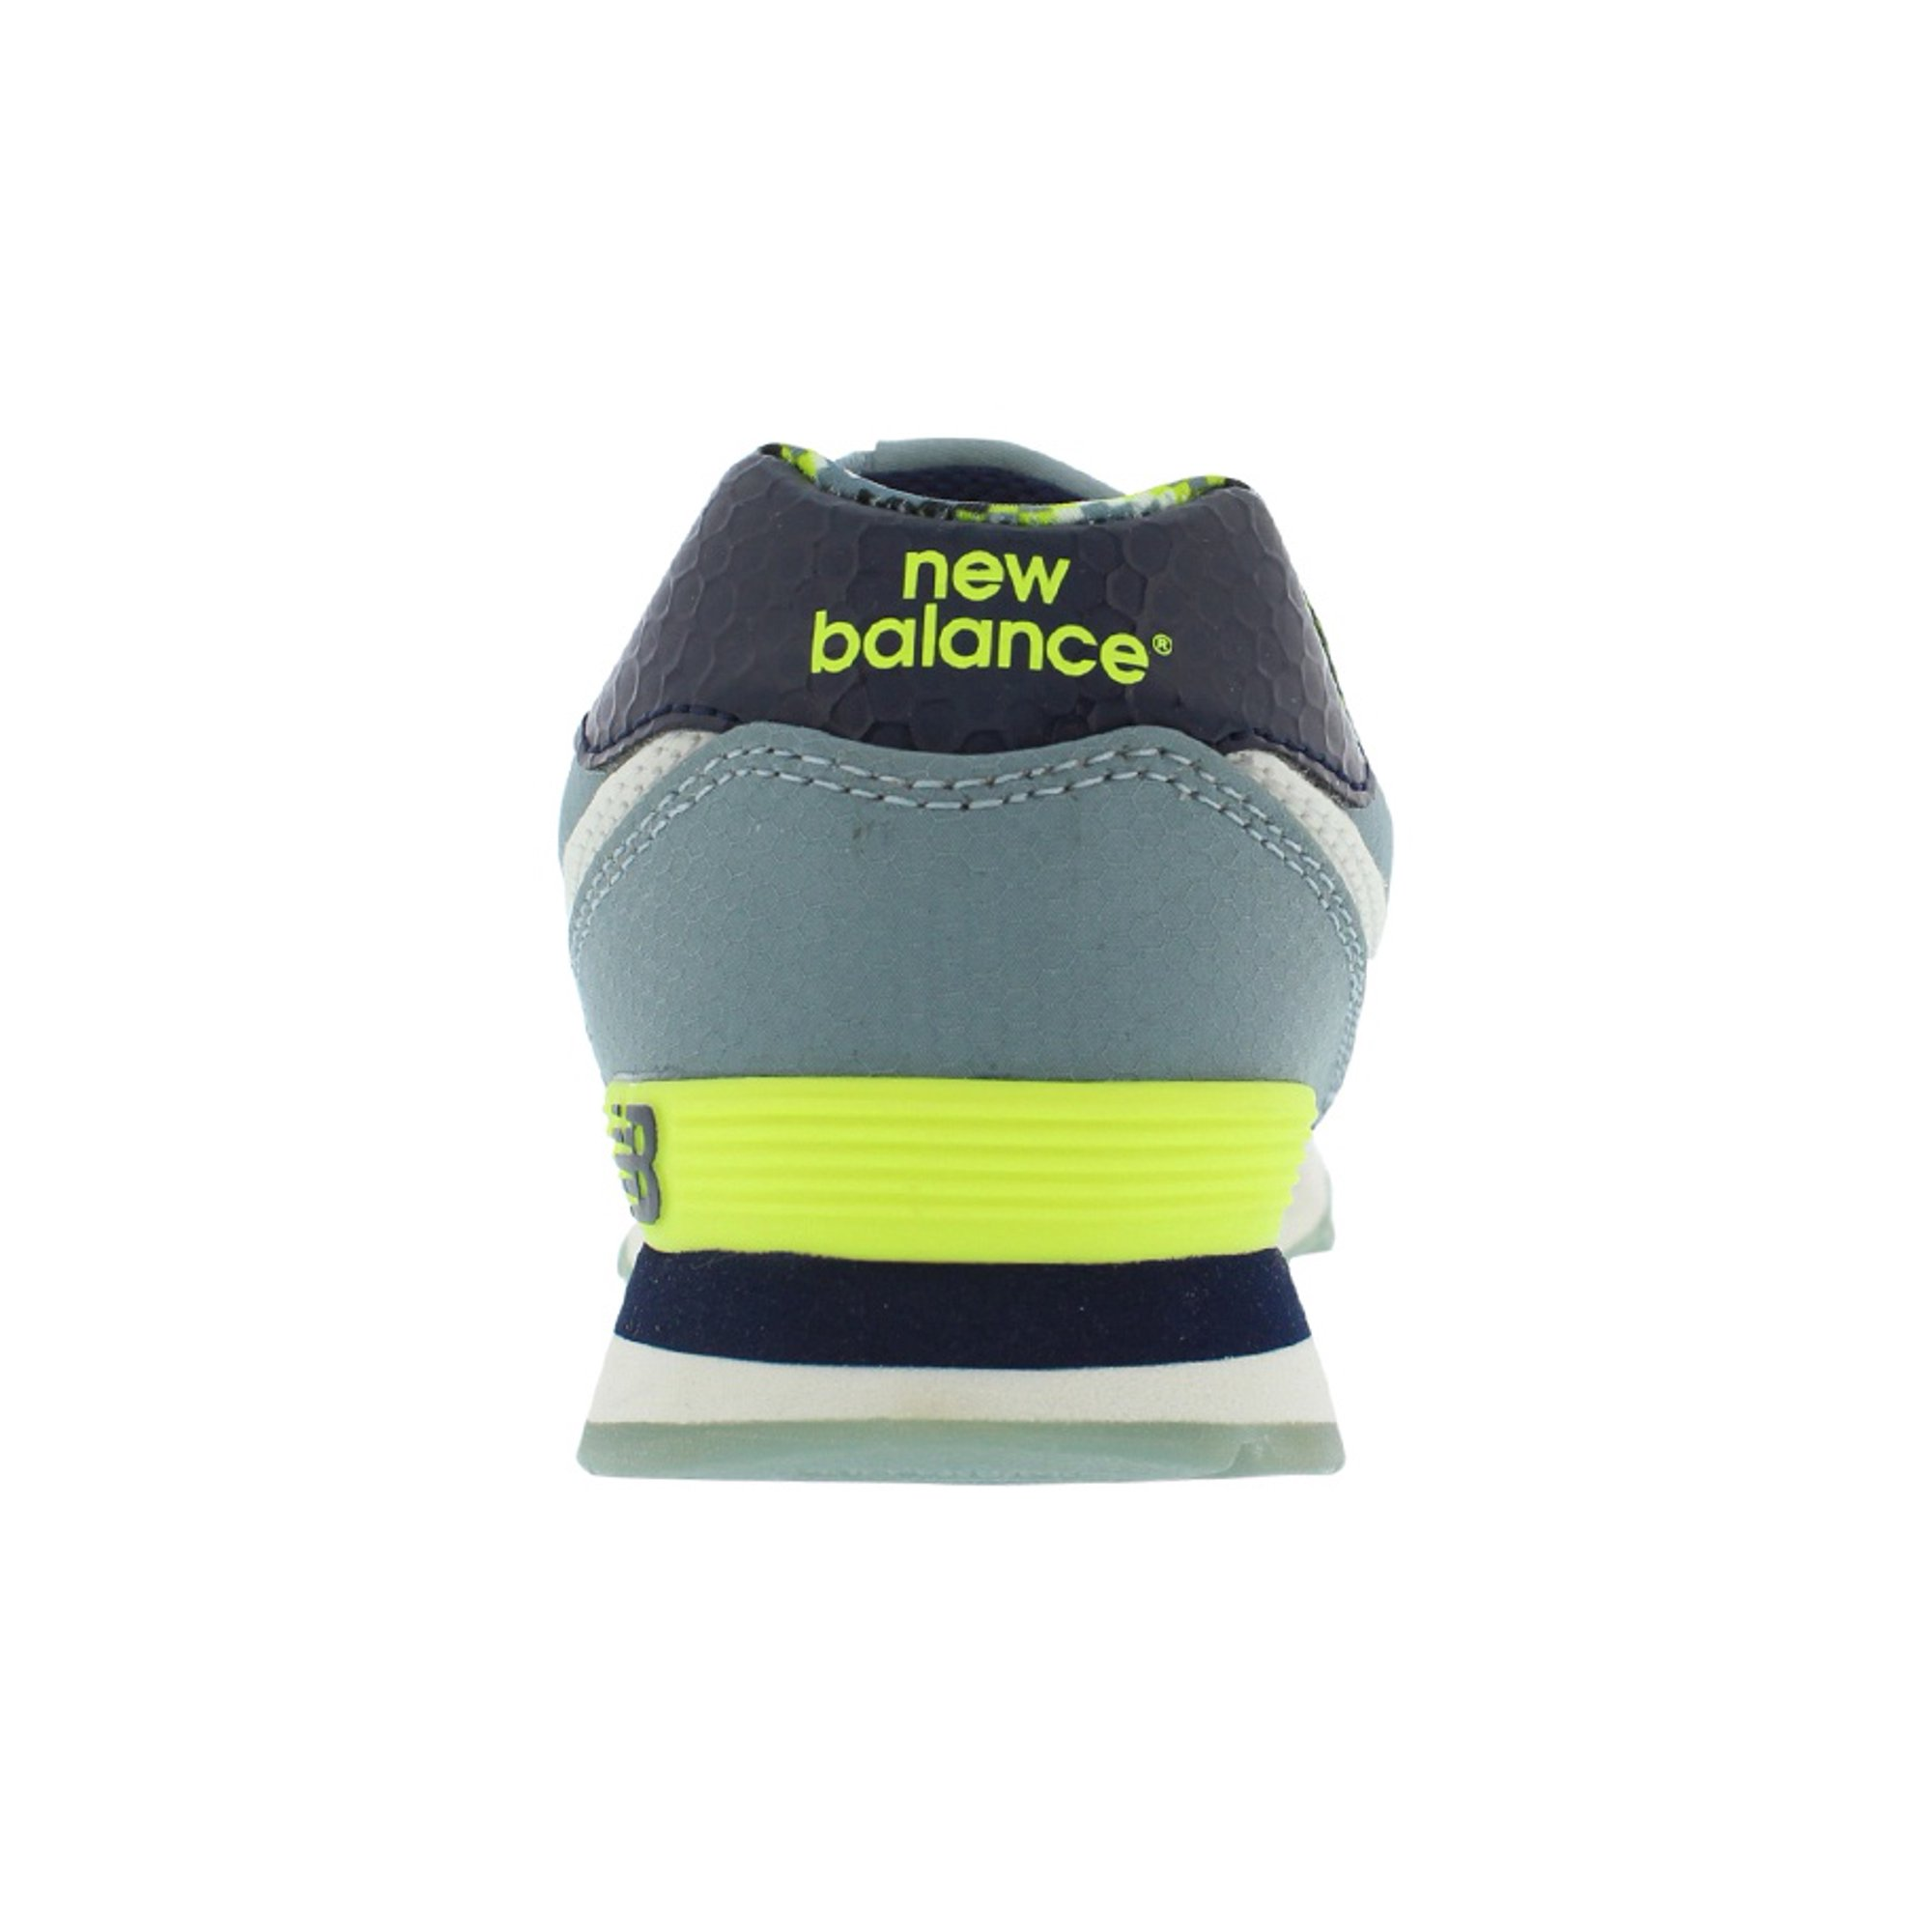 e88c2a61f427f Buy New Balance 574 Boy s Shoes Size